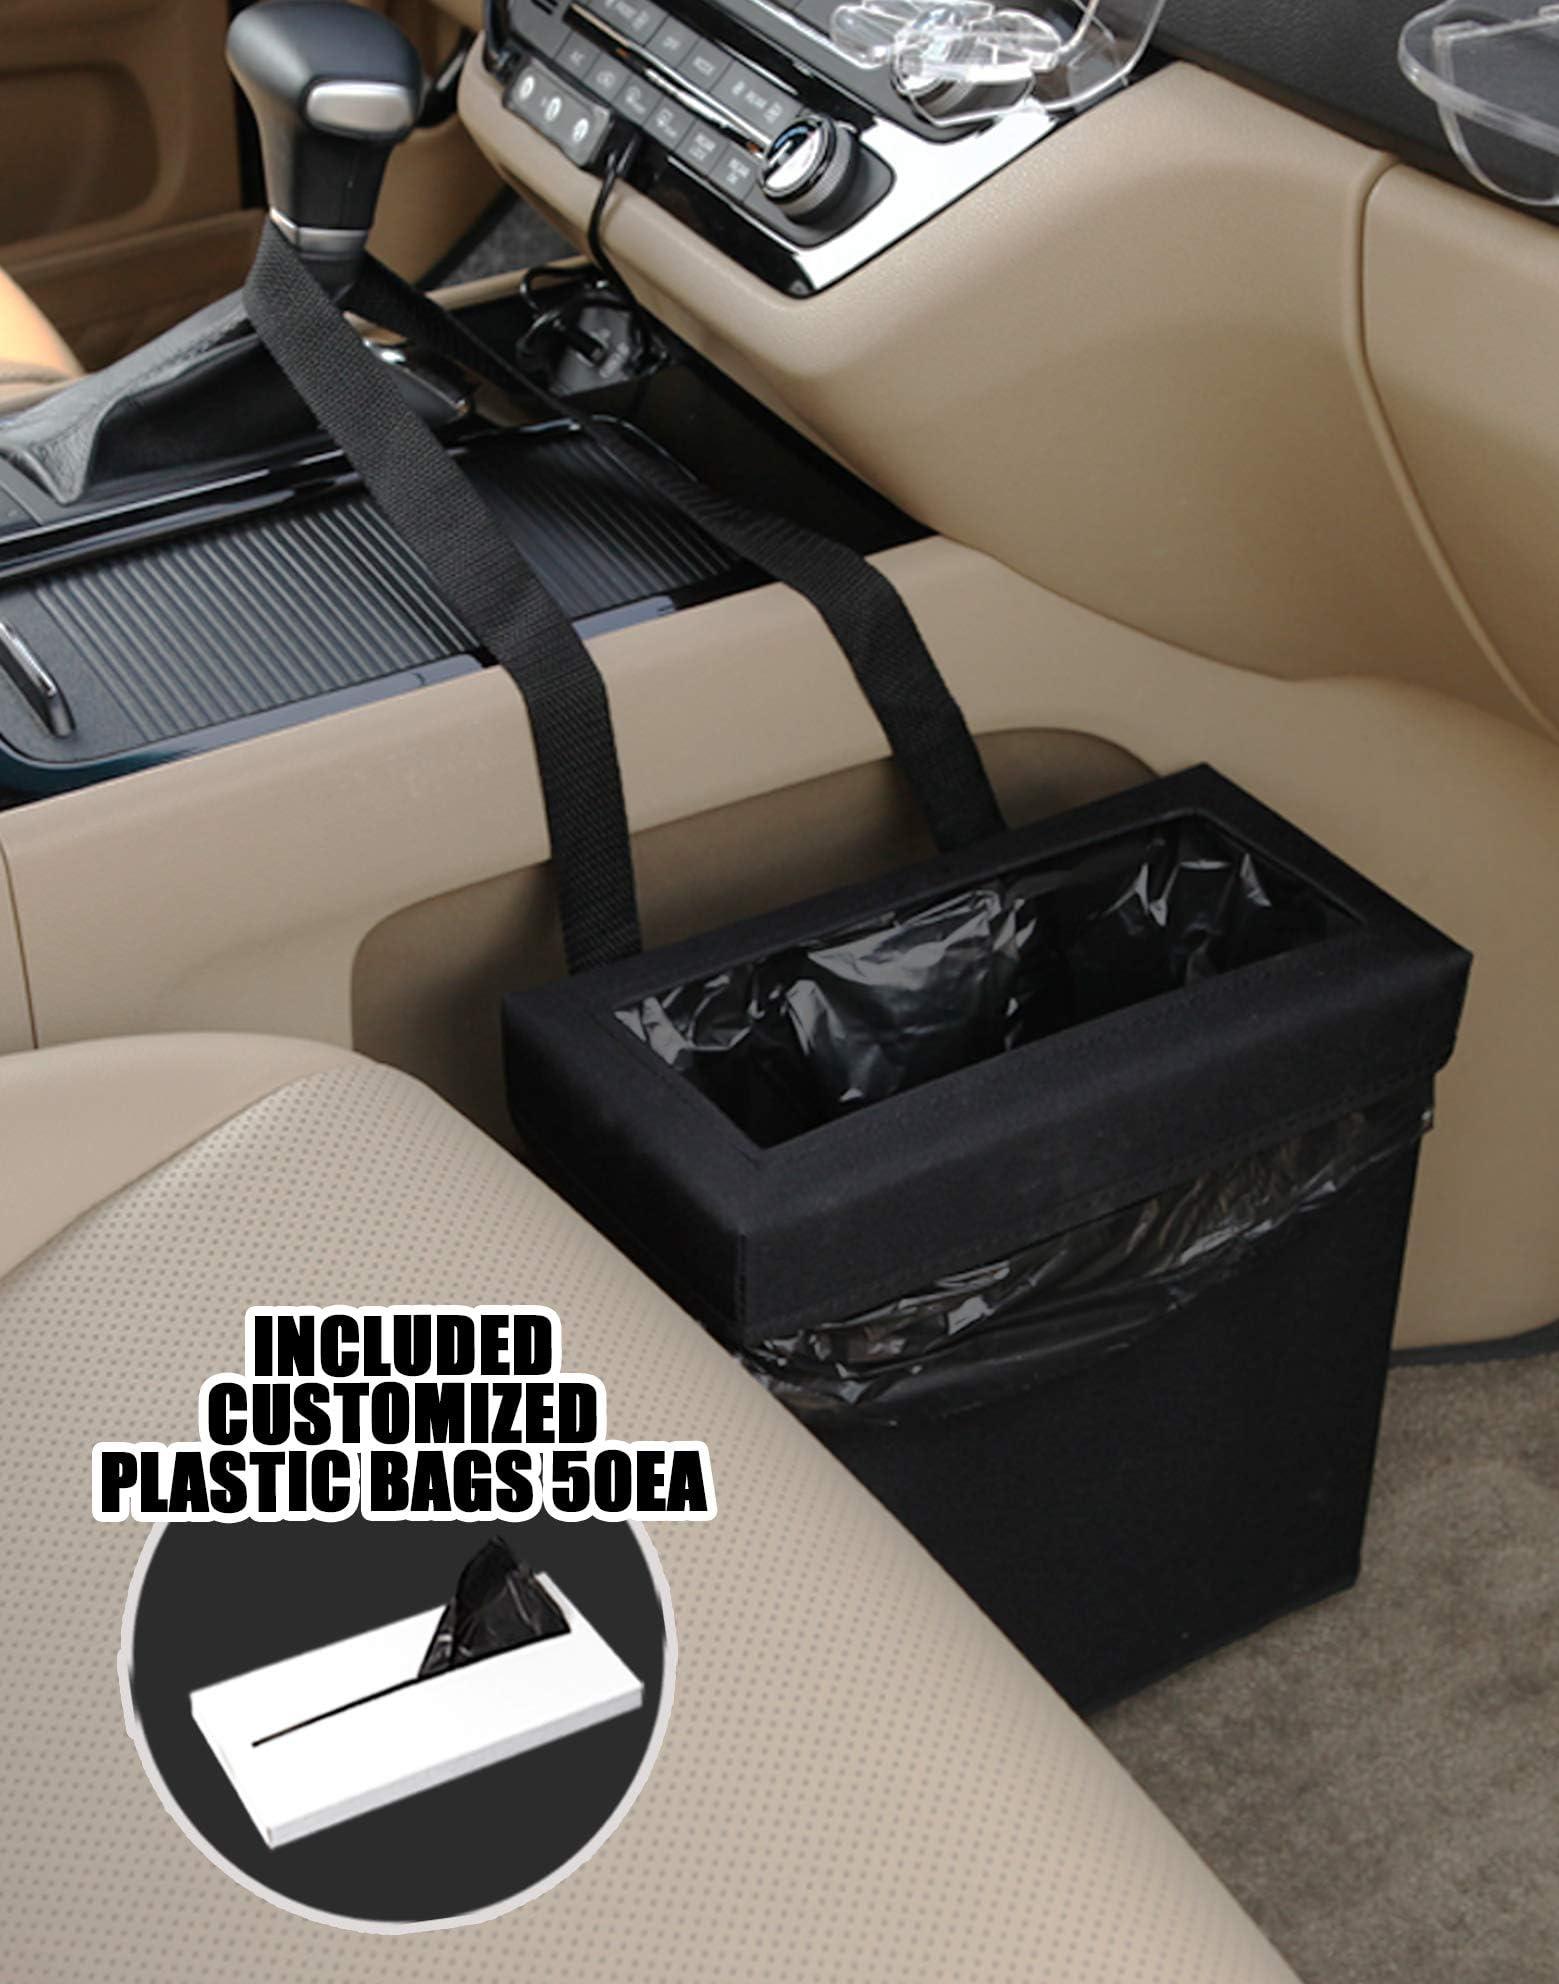 KMMOTORS Aladdin Foldable Car Garbage Can Trash Can Wastebasket Oxford Clothes Car Organizer Car Gadget